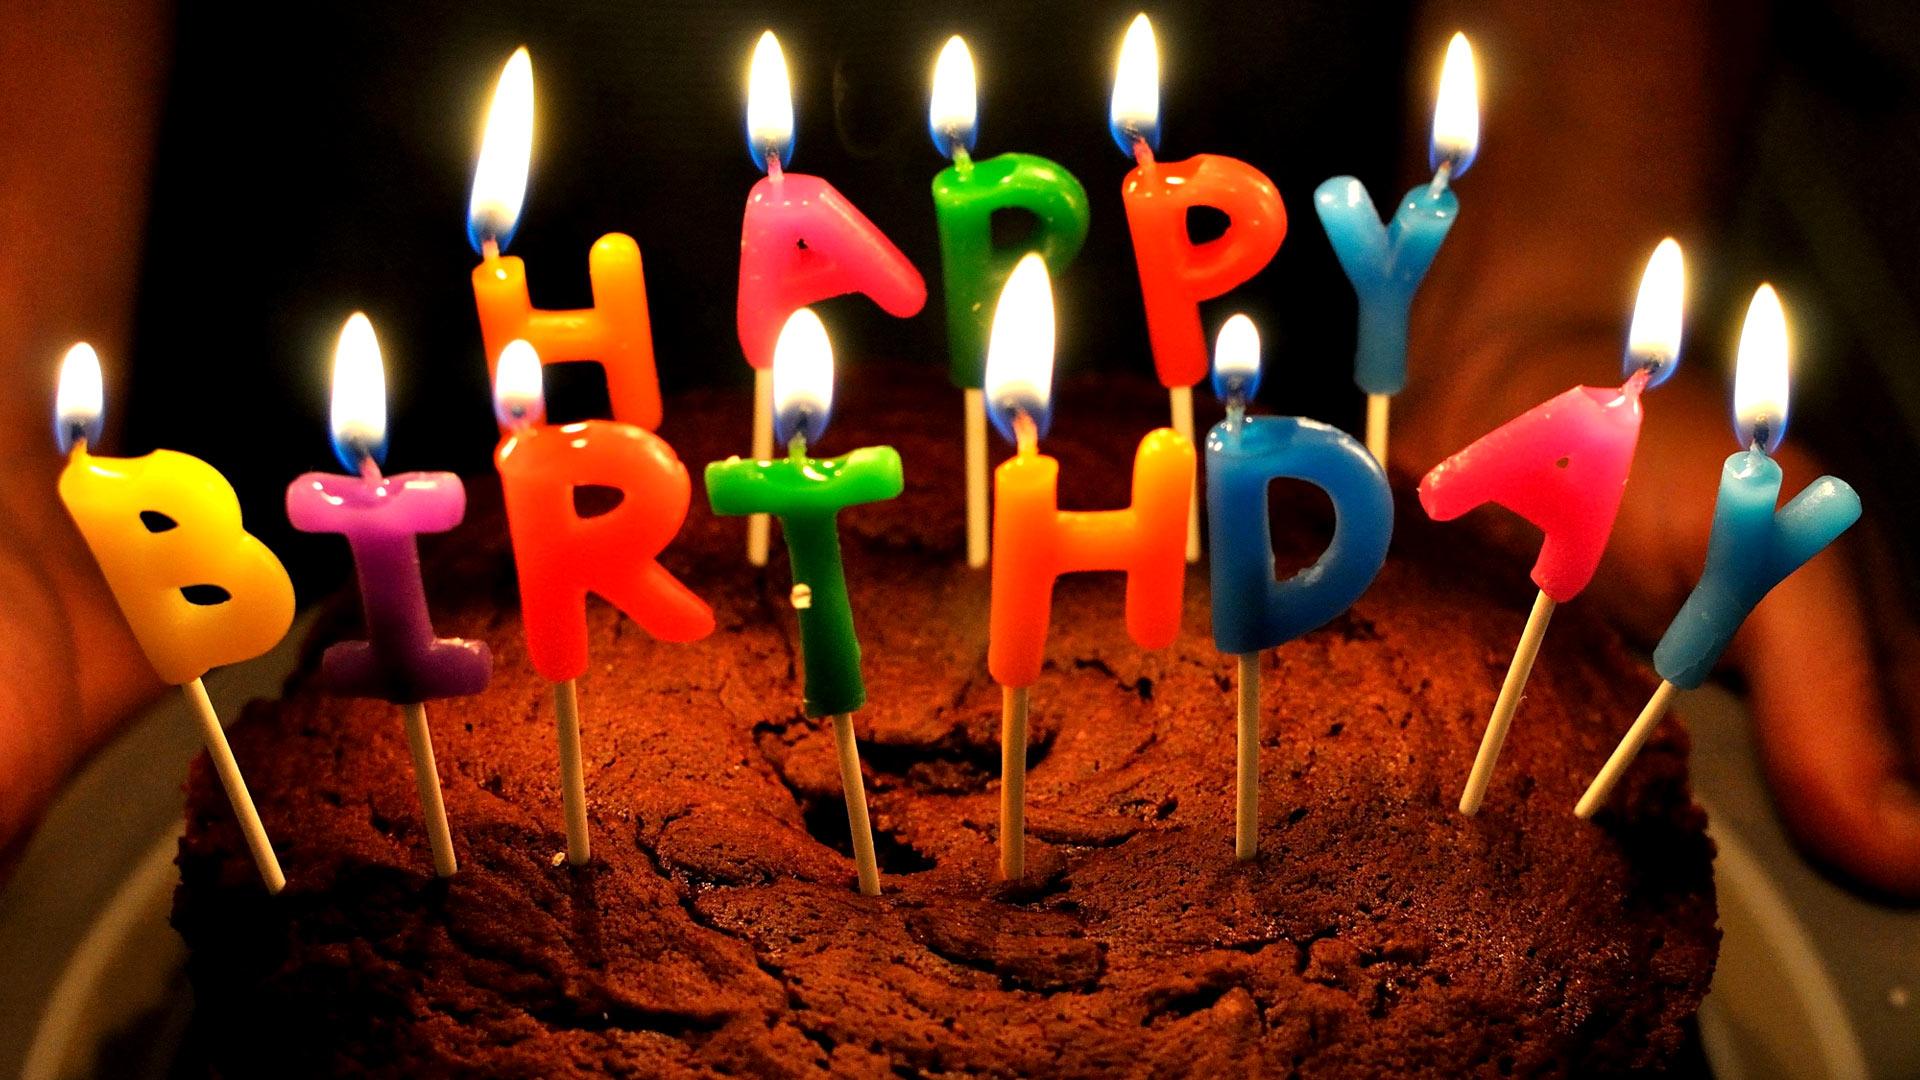 Birthday Candles Wallpaper Phone Vibes